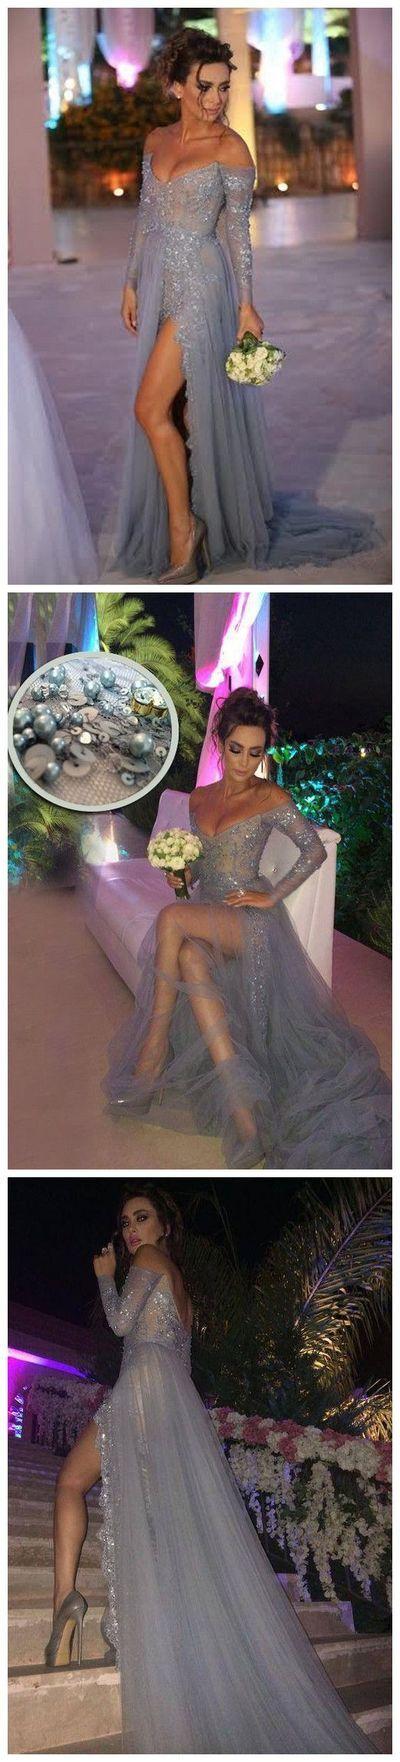 Charming Prom Dress,Long Sleeve Prom Dress,High Slit Prom